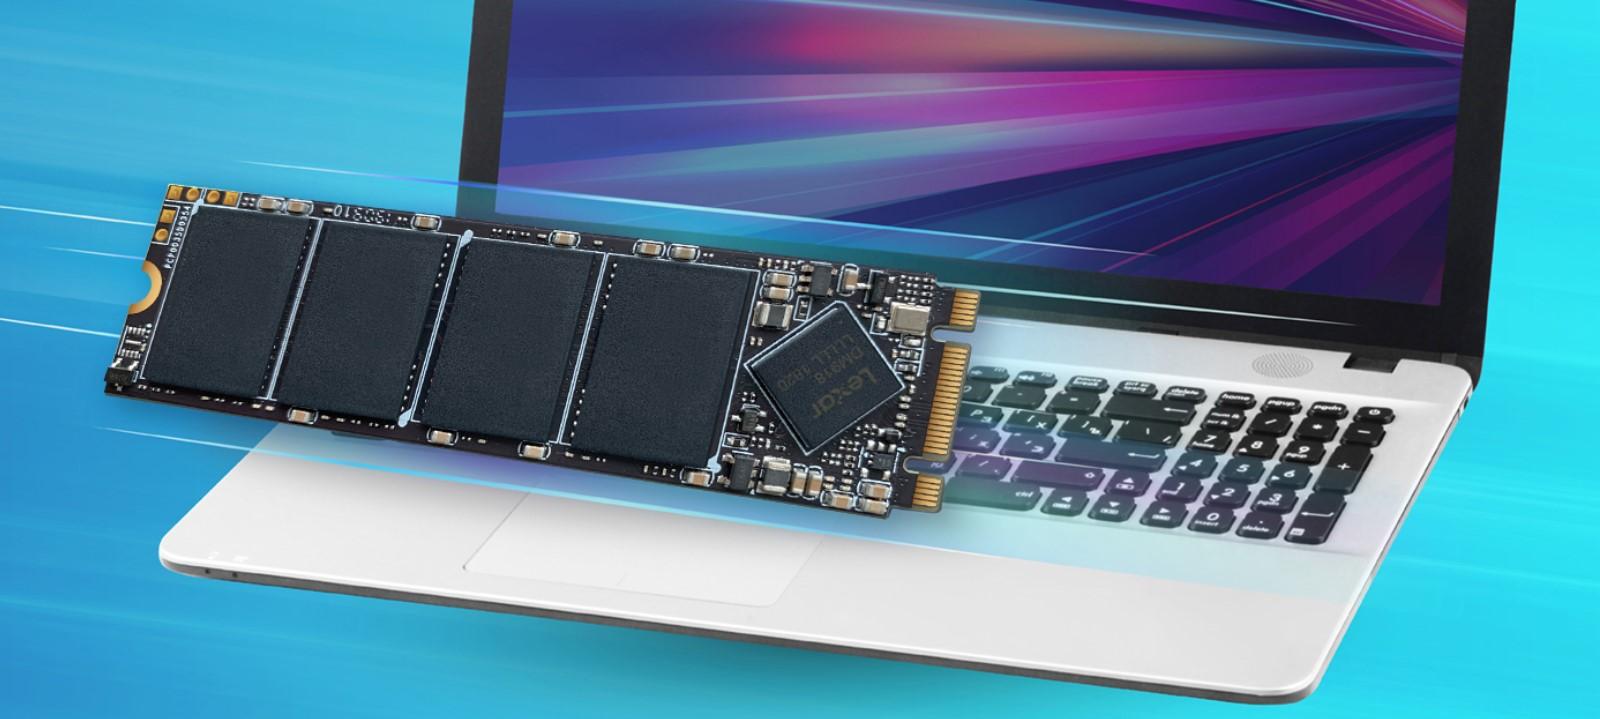 Ổ cứng SSD Lexar NM100 128GB M.2 2280